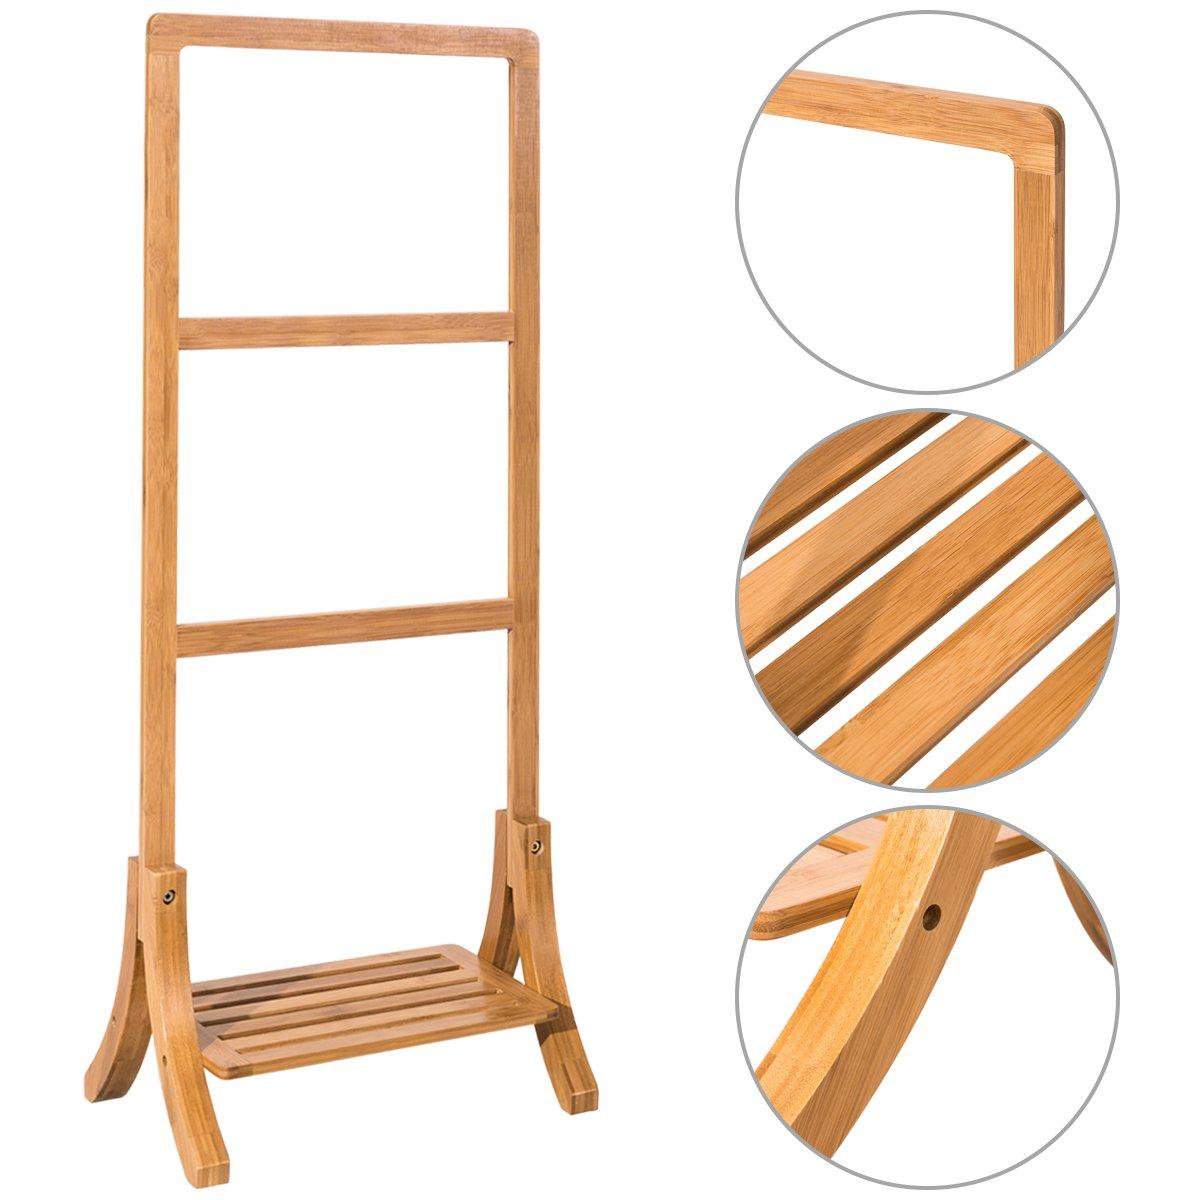 Tangkula Towel Rack 3-Bar Free Standing Bathroom Bamboo Towel Stand Holder Organizer with Shelf